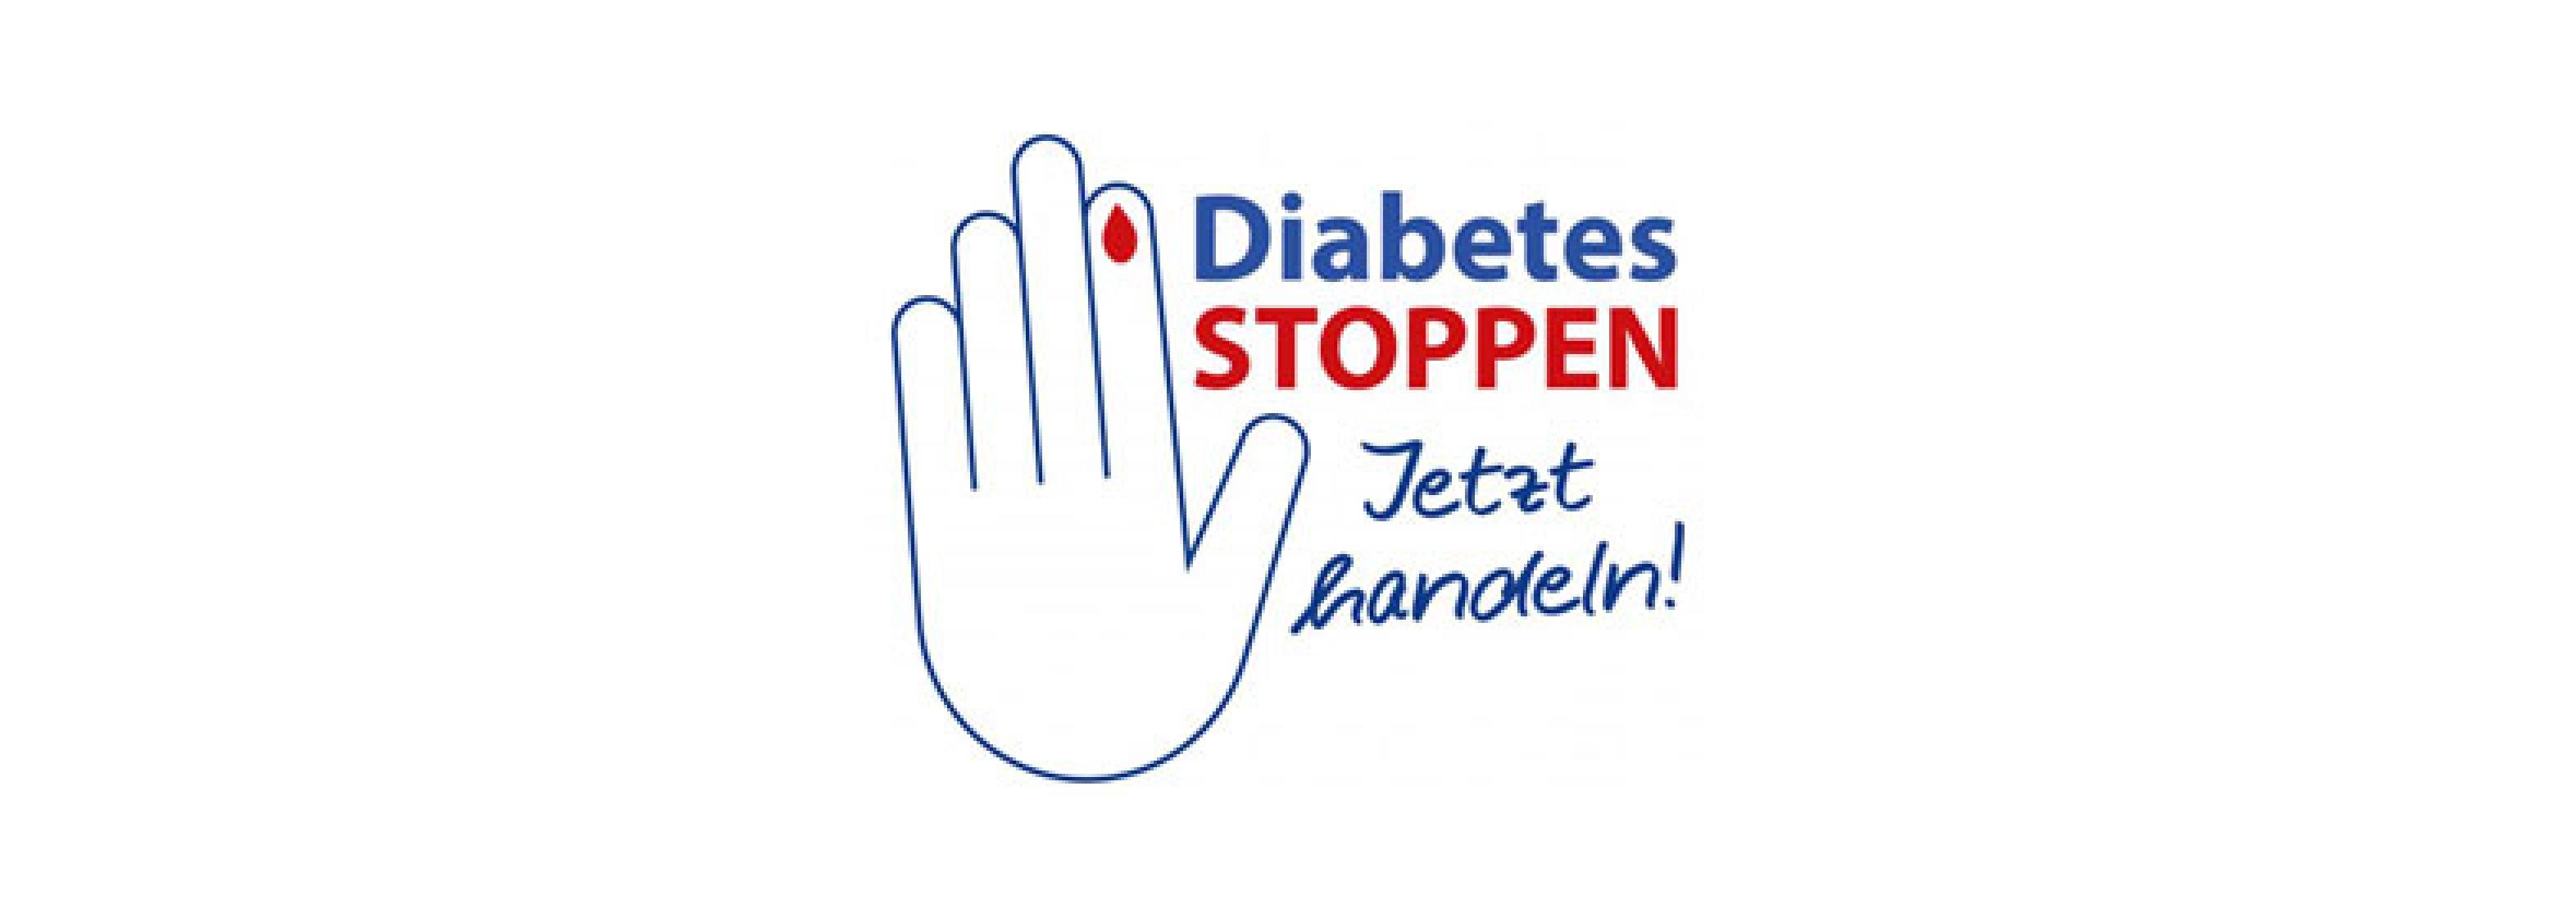 Diabetes stoppen. Jezt handeln!